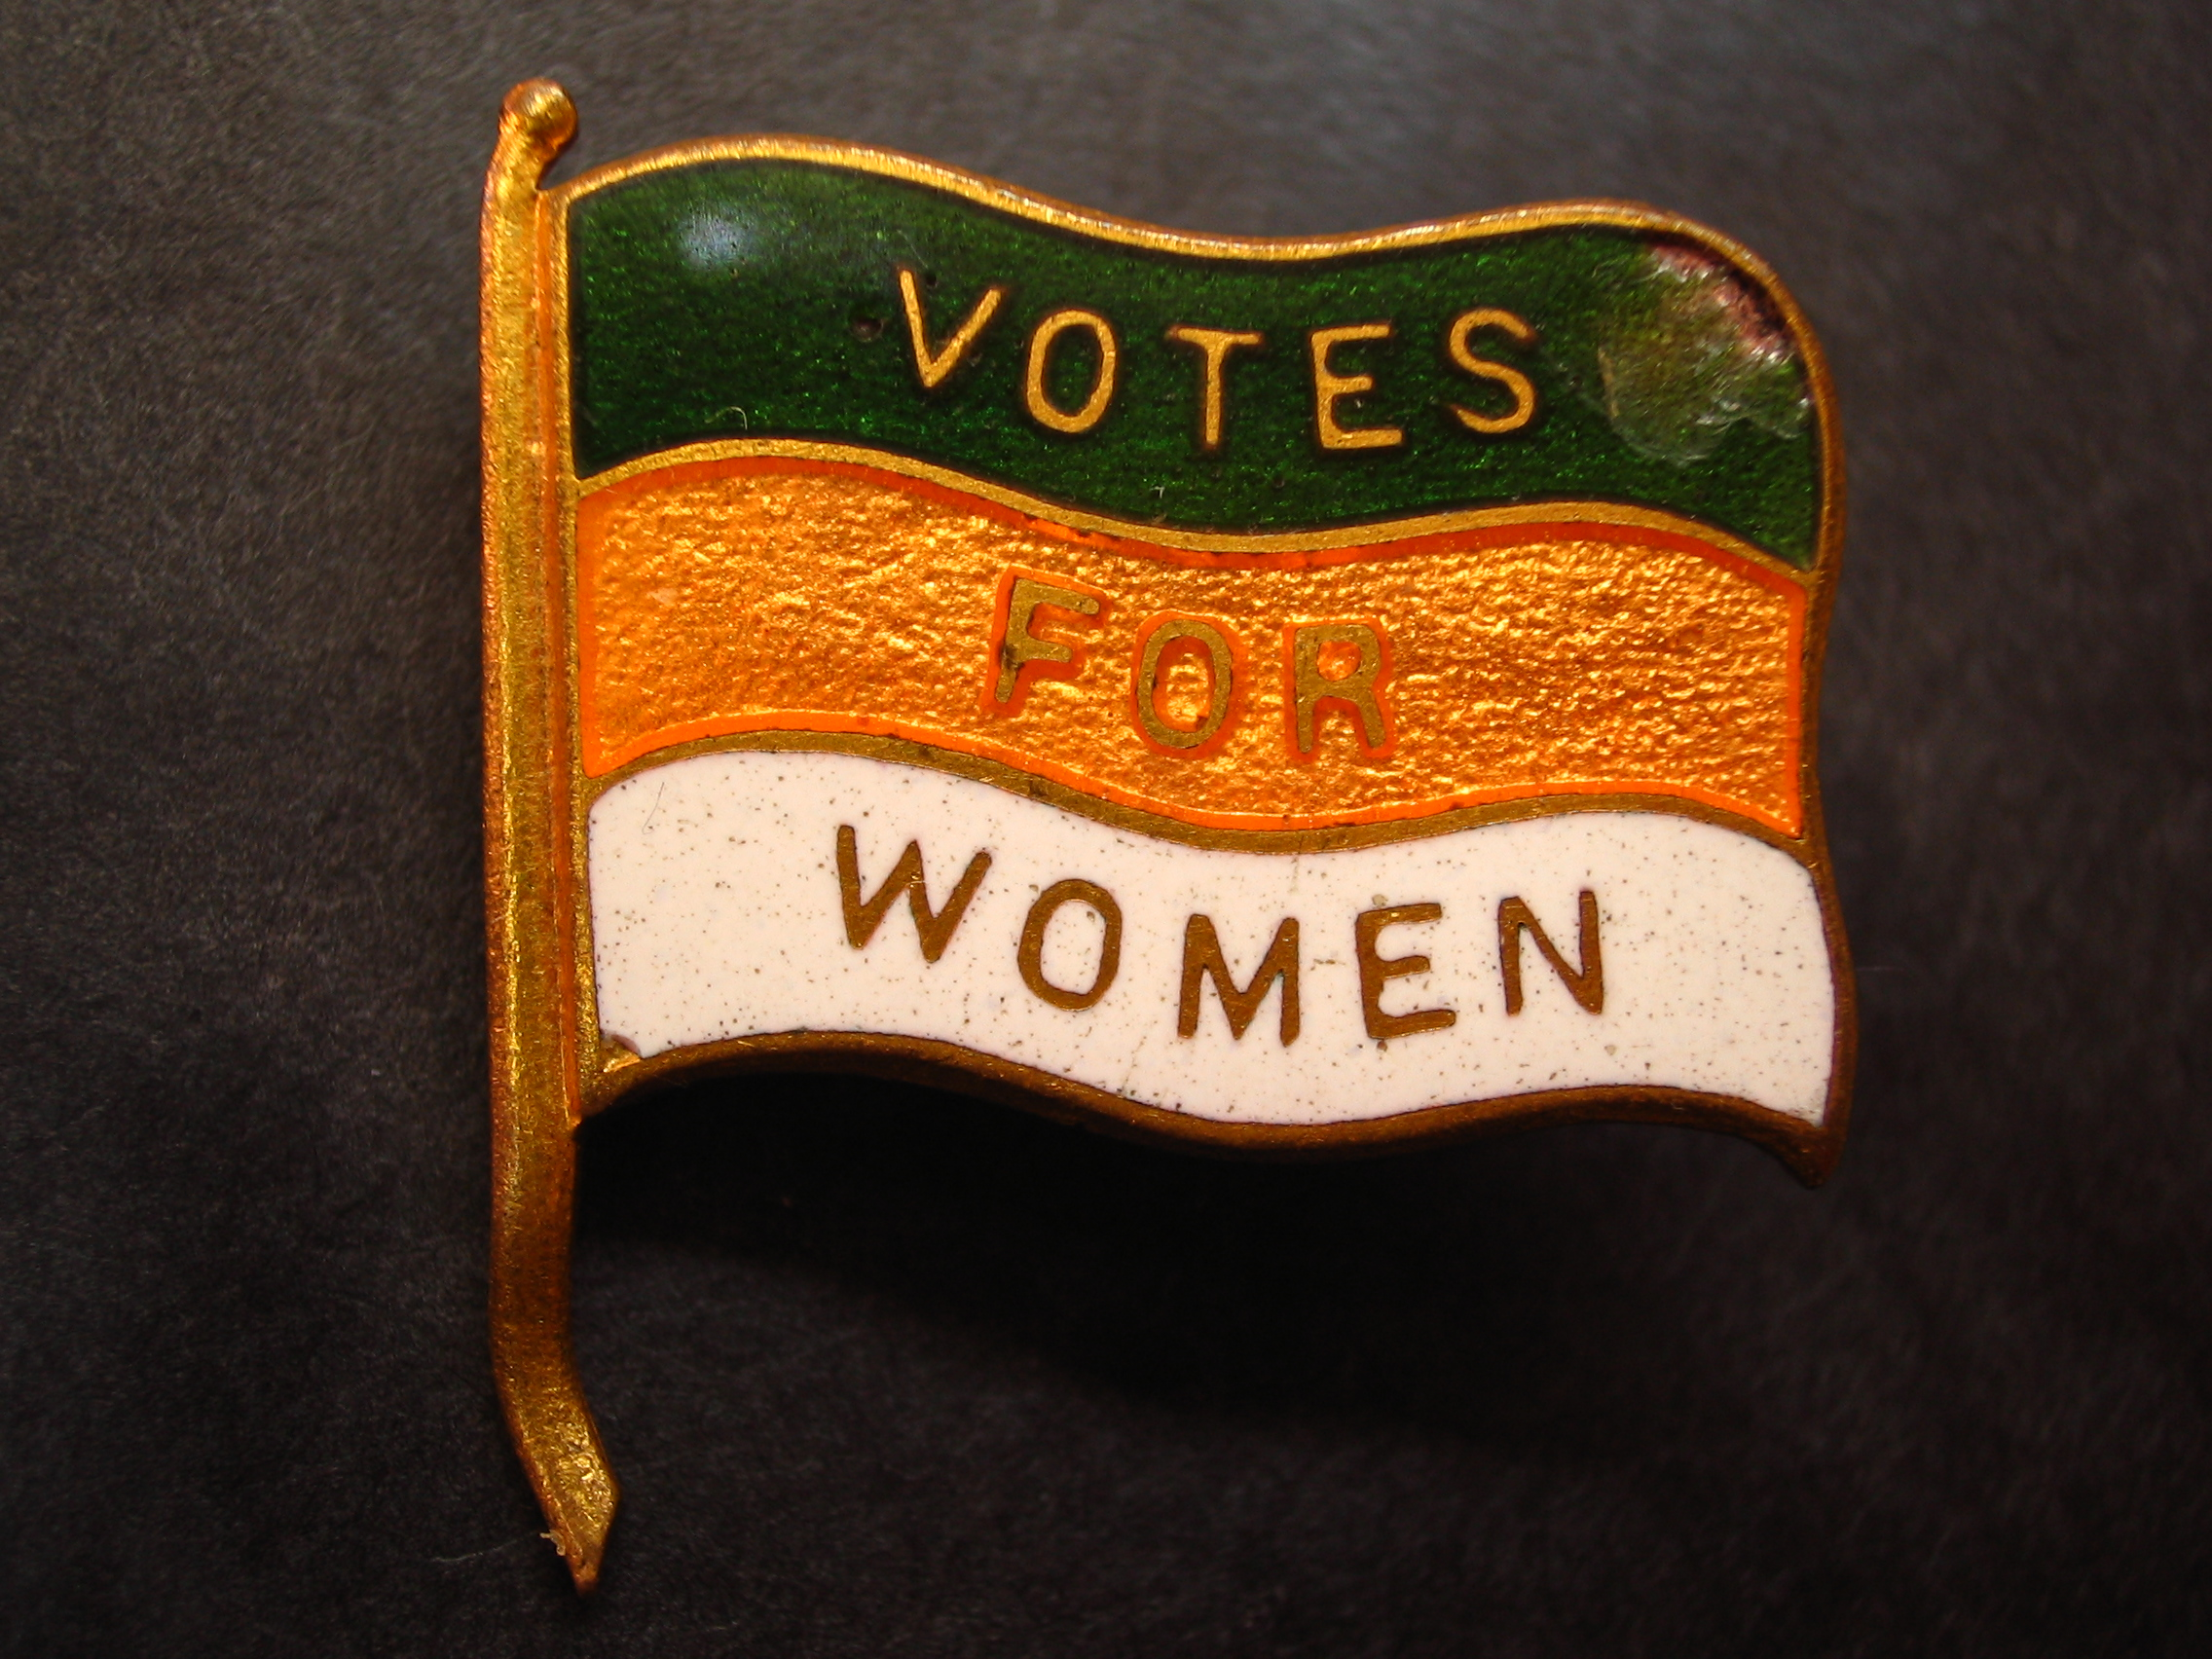 Votes_for_Women_lapel_pin_Nancy.jpg